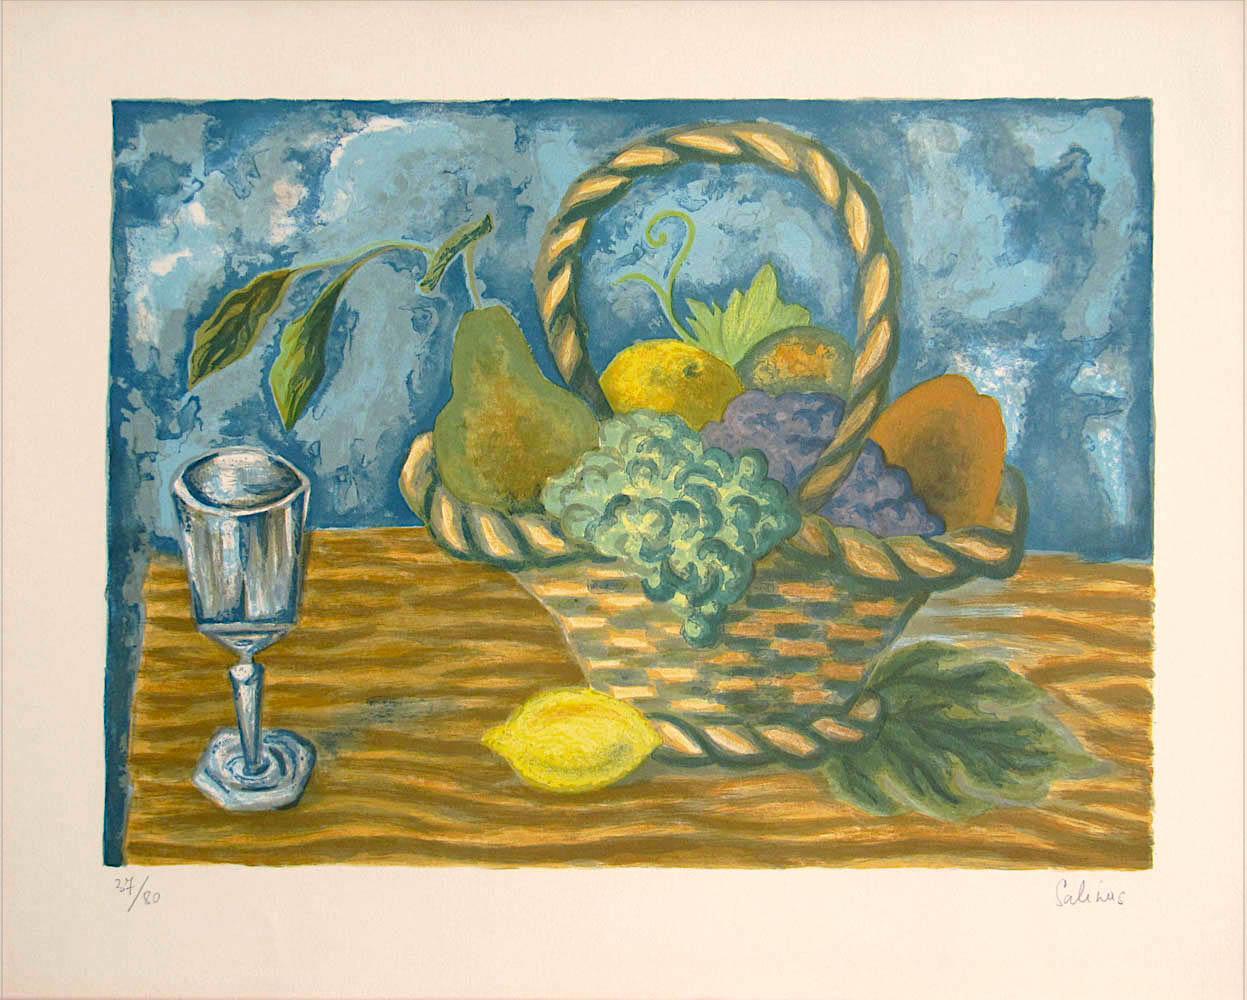 FRUIT BASKET Signed Lithograph, Interior Still Life, Lemon Yellow, Blue, Brown